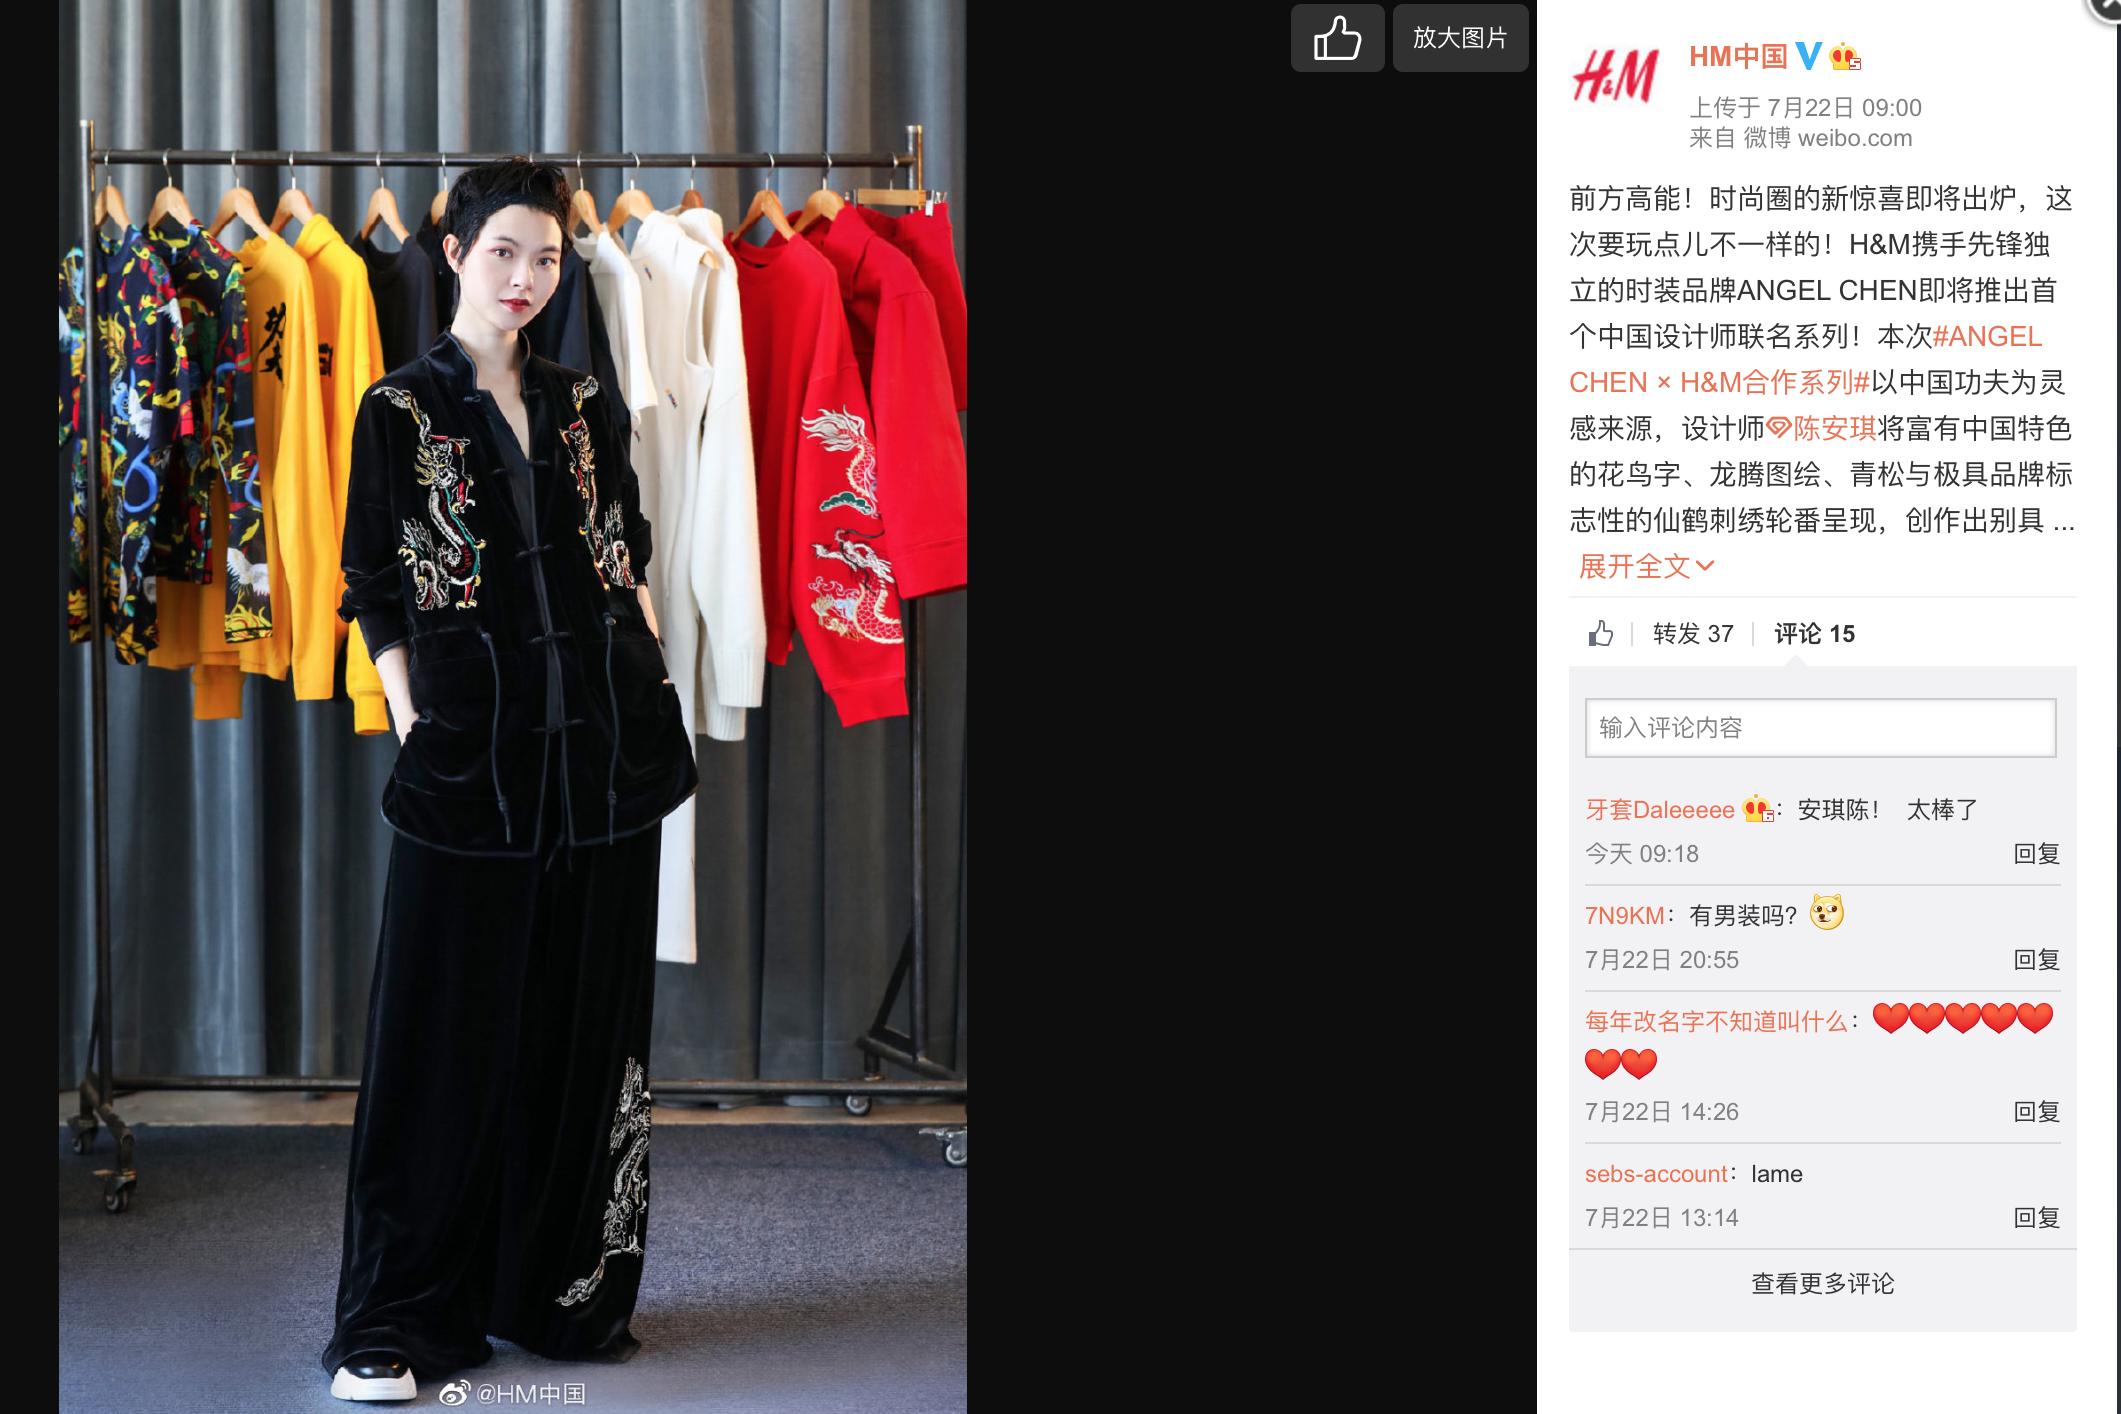 Angel Chen 成为首个与 H&M 推出联名系列的中国设计师